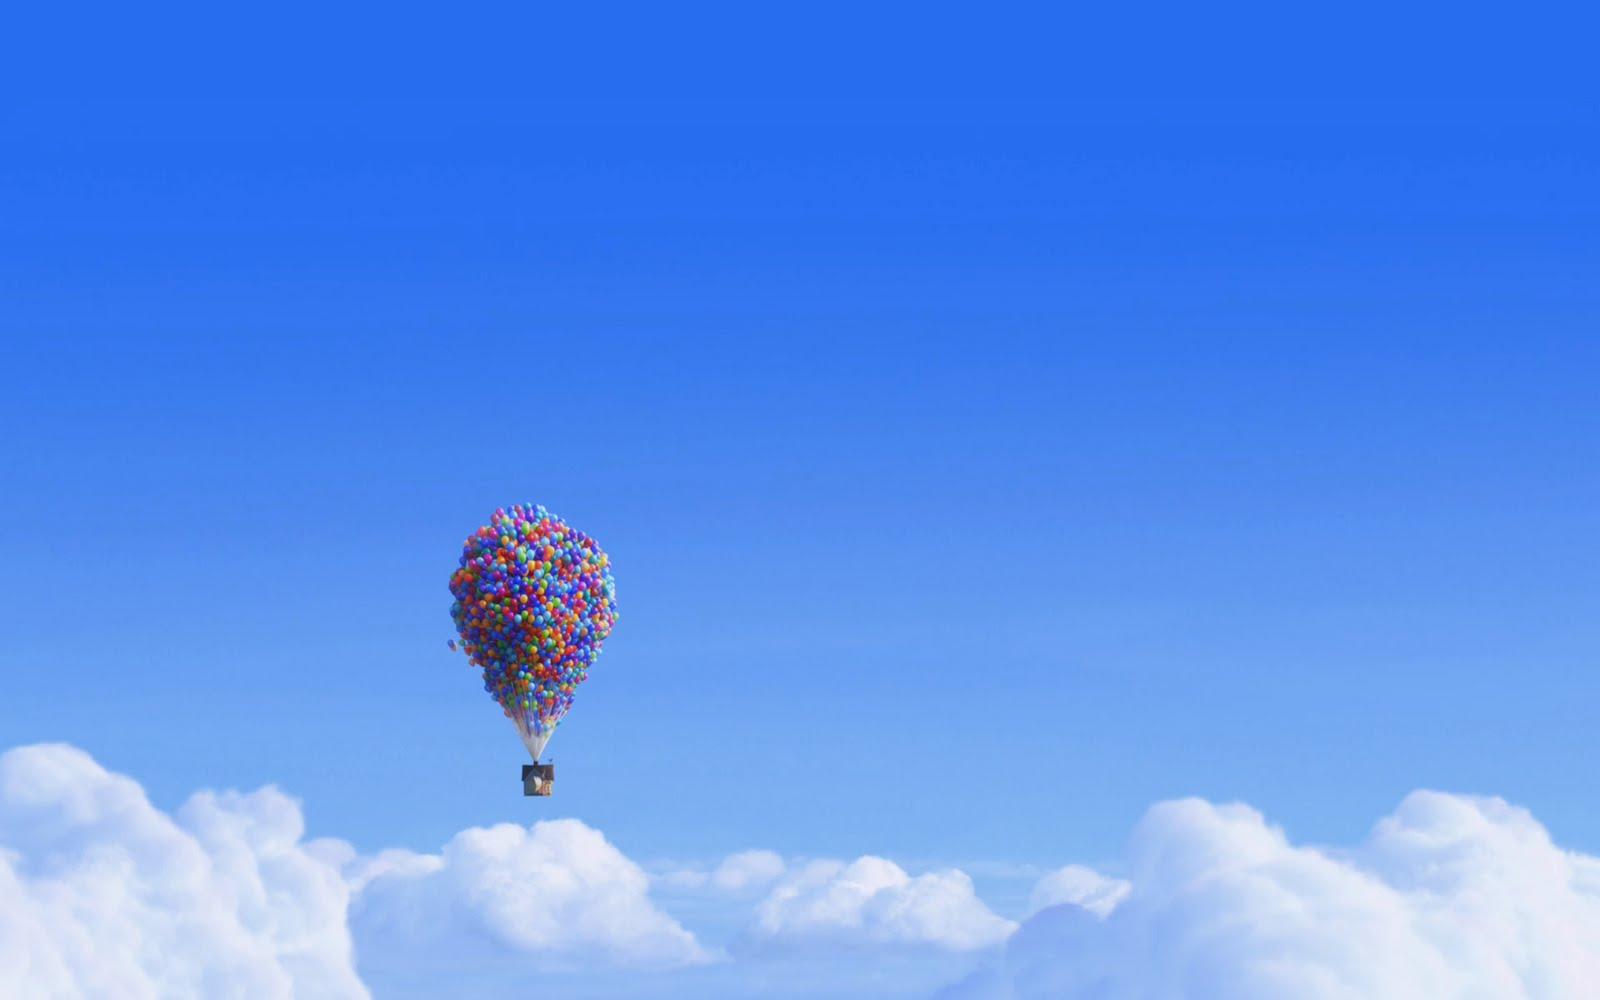 Up Pixar Animation HD WallpapersRussell Up Pixar Wallpaper